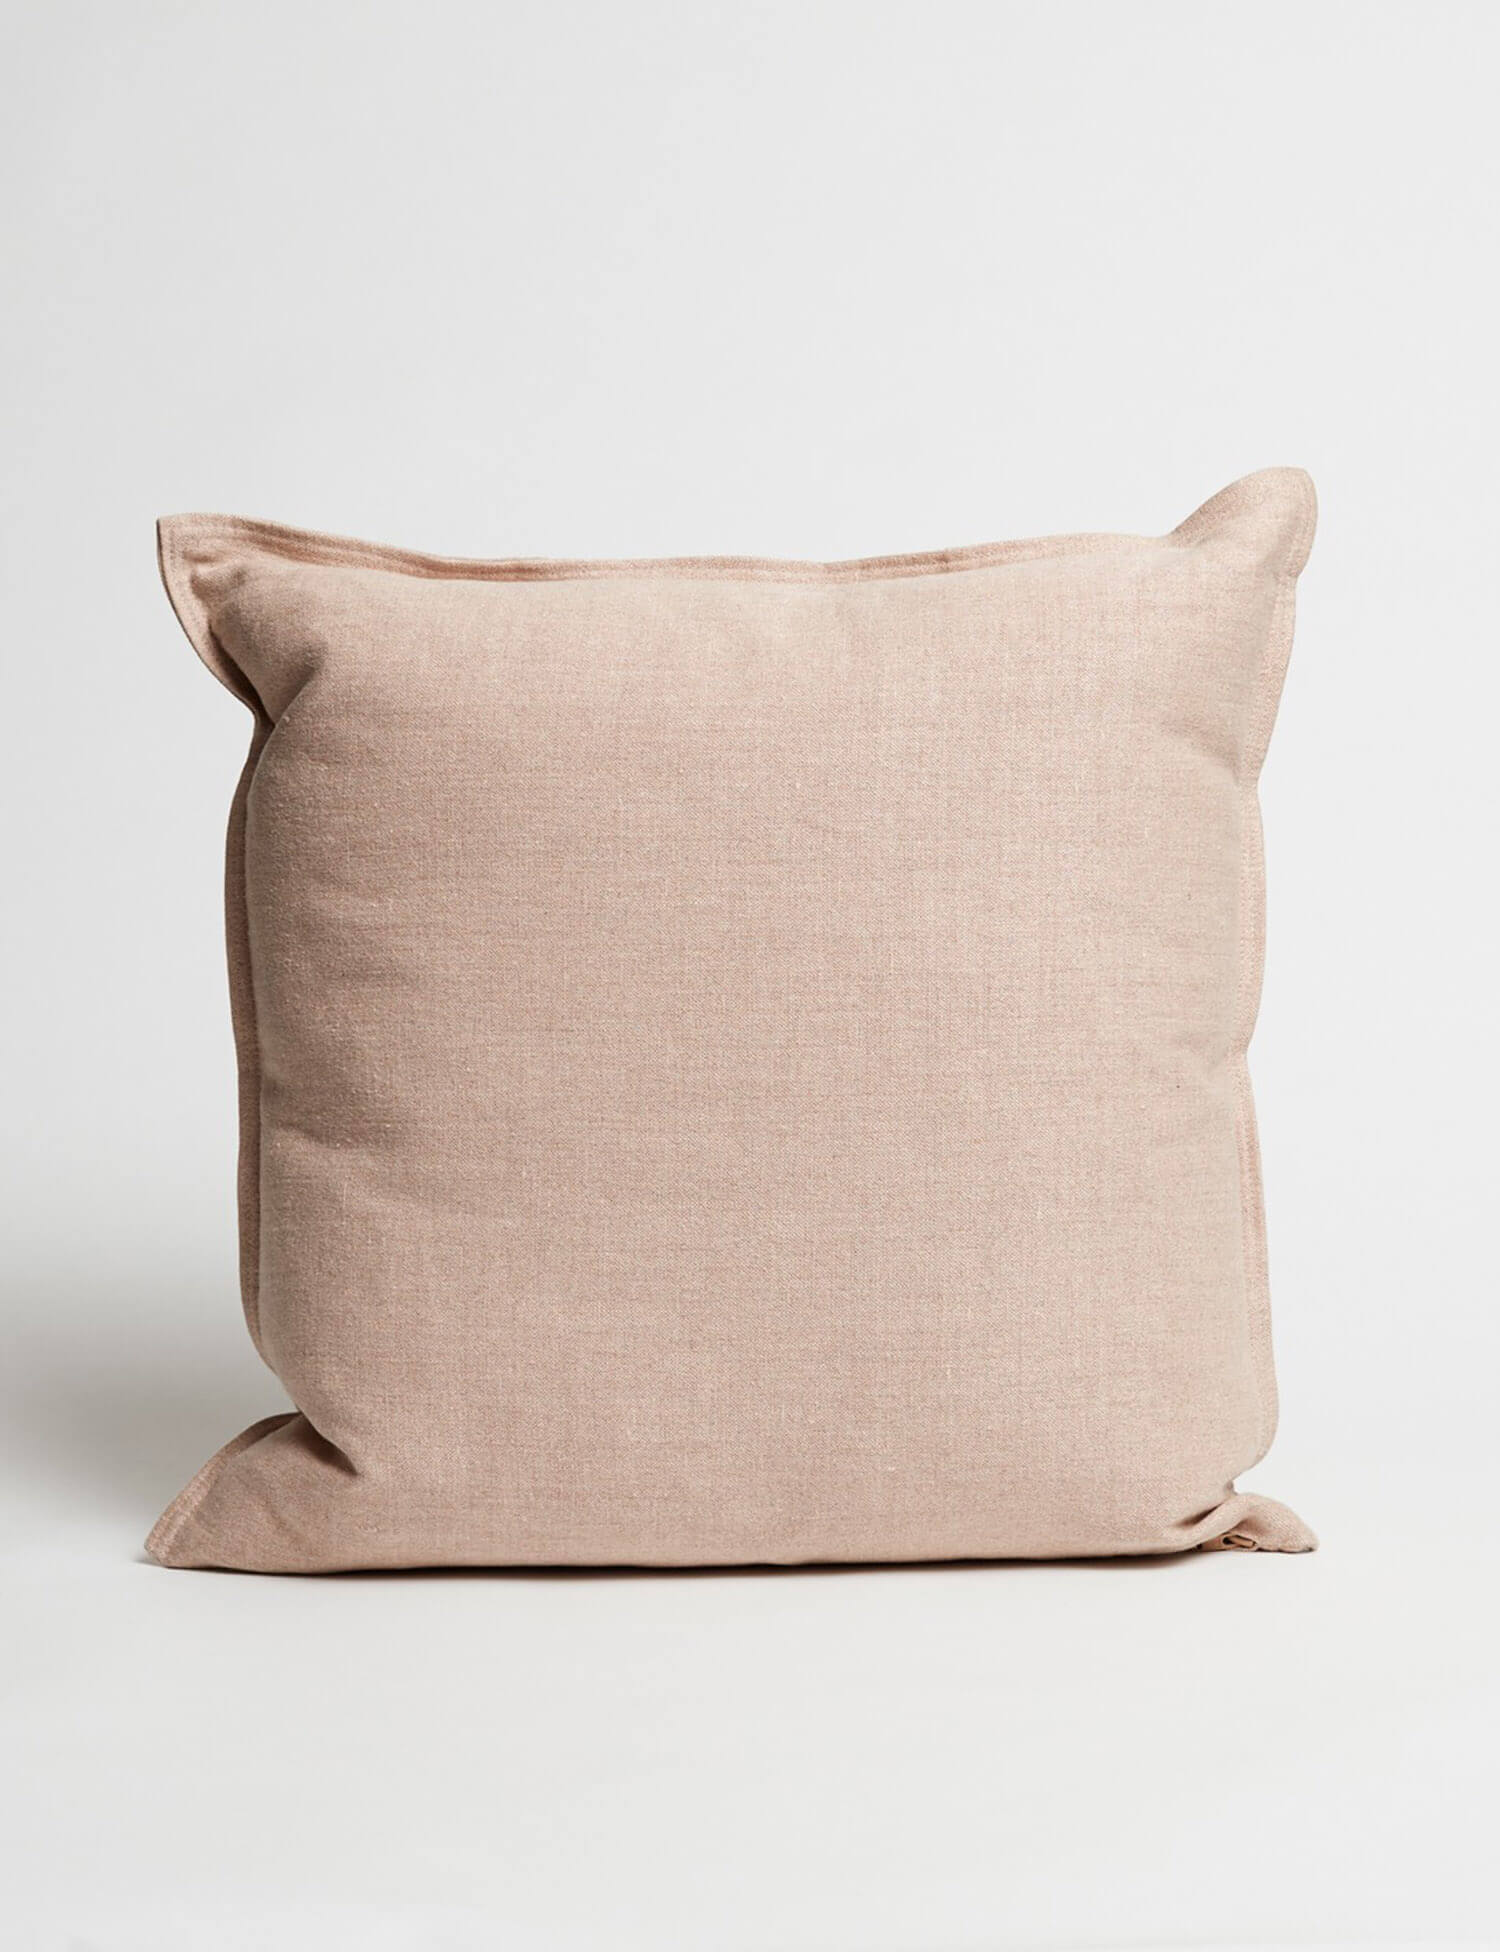 est living design directory abode living madison cushion.01